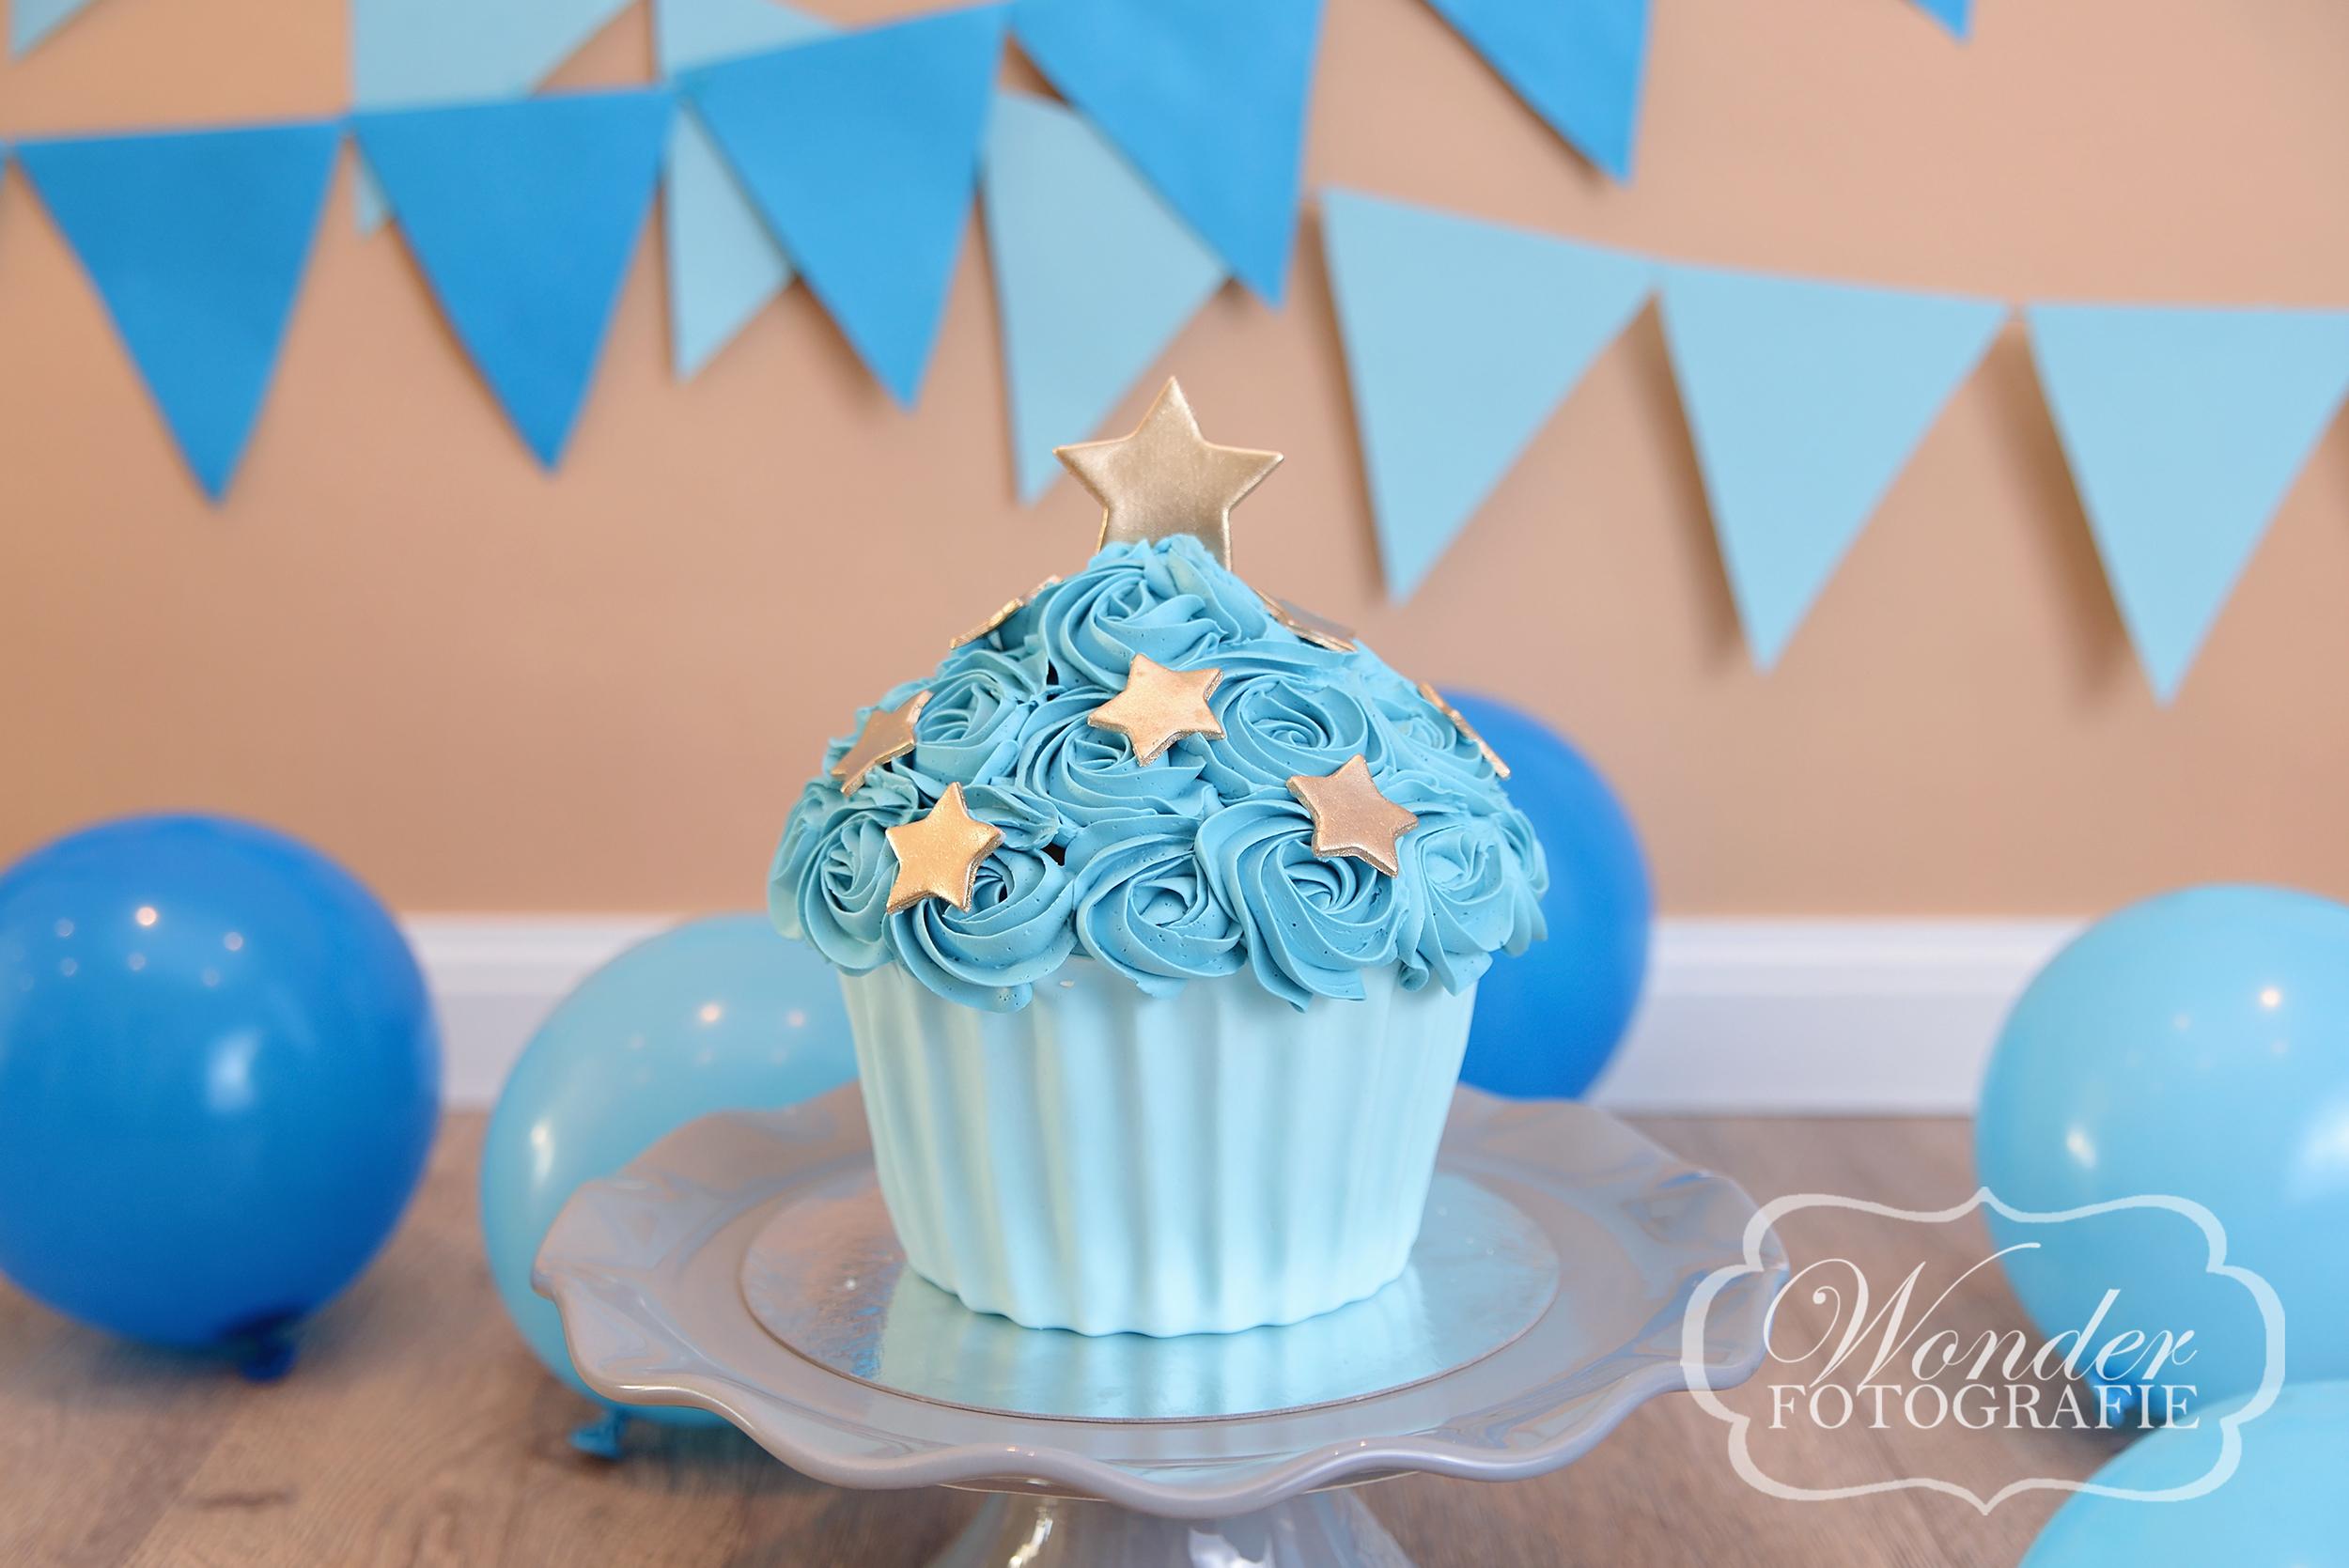 Cake Smash Blauw Bruin Vintage - Wonder Fotografie